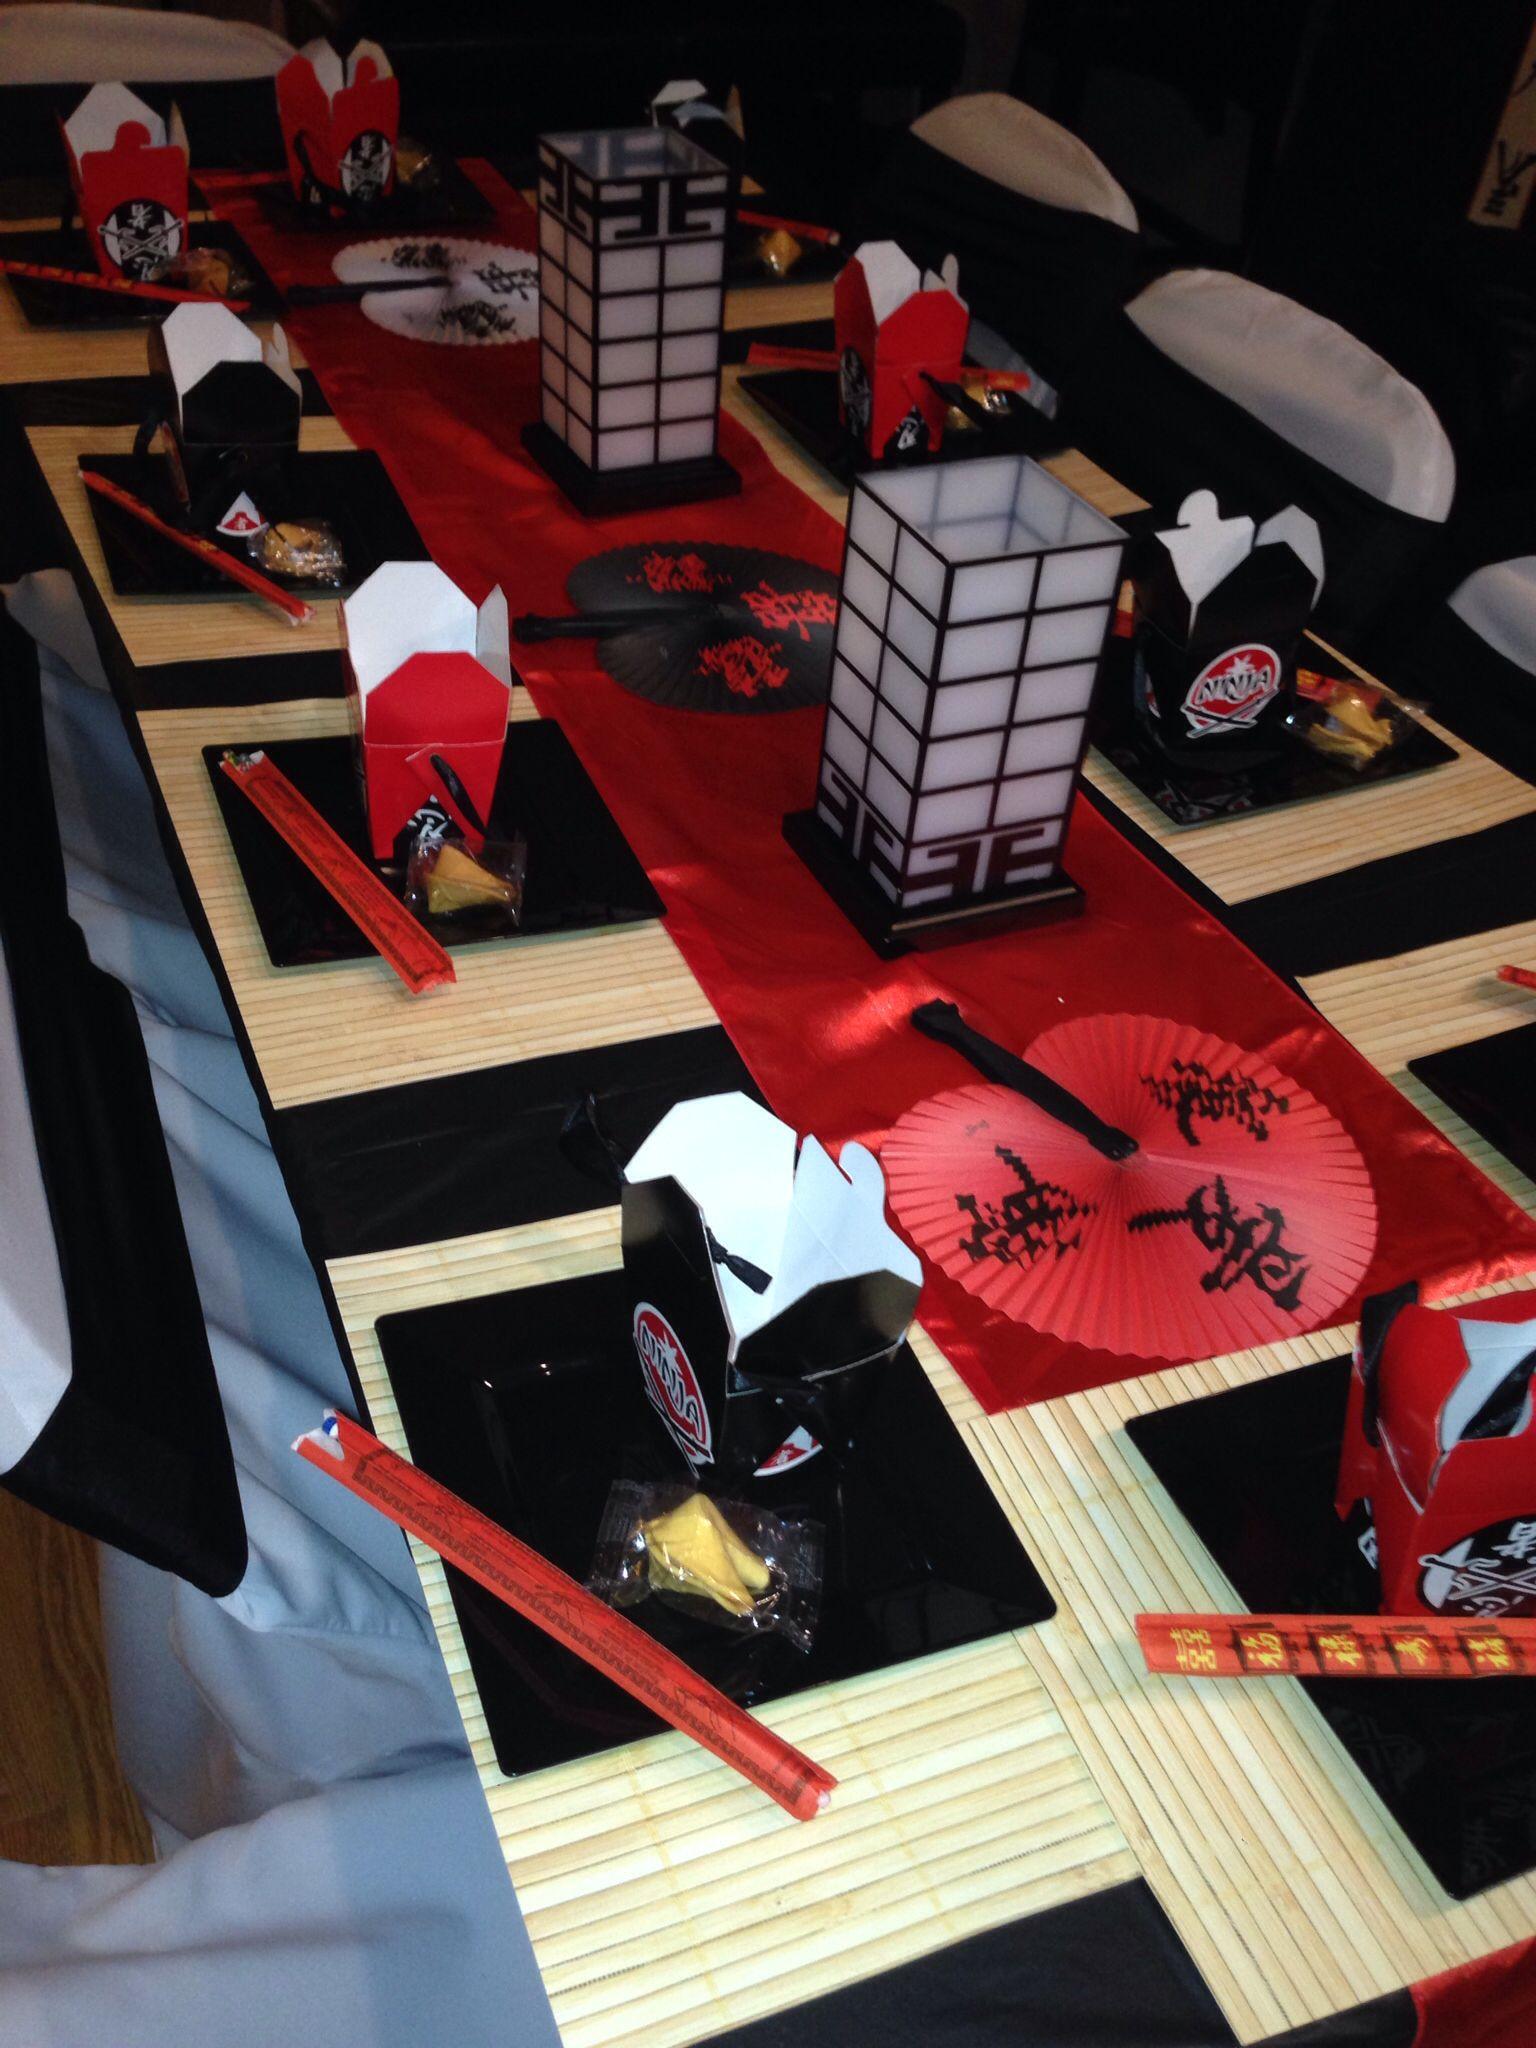 Gmail ninja theme - Asian Theme Party